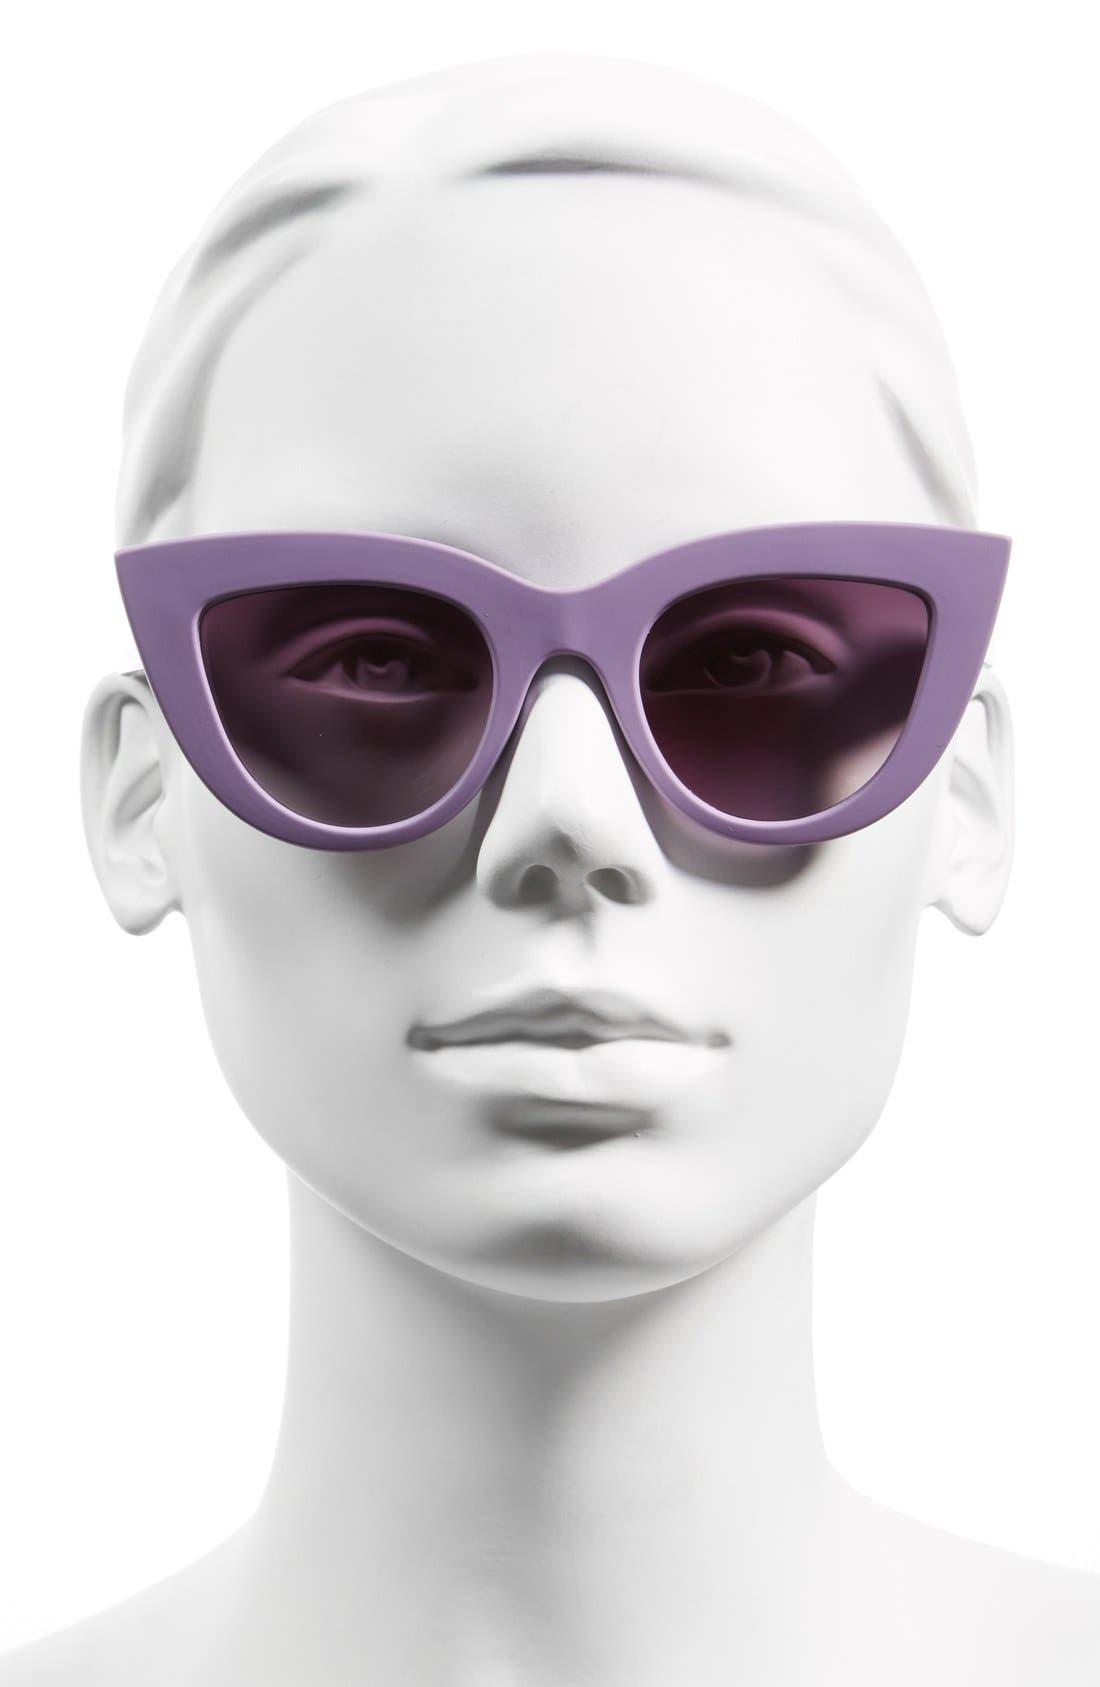 42mm Cat Eye Sunglasses,                             Alternate thumbnail 2, color,                             Purple